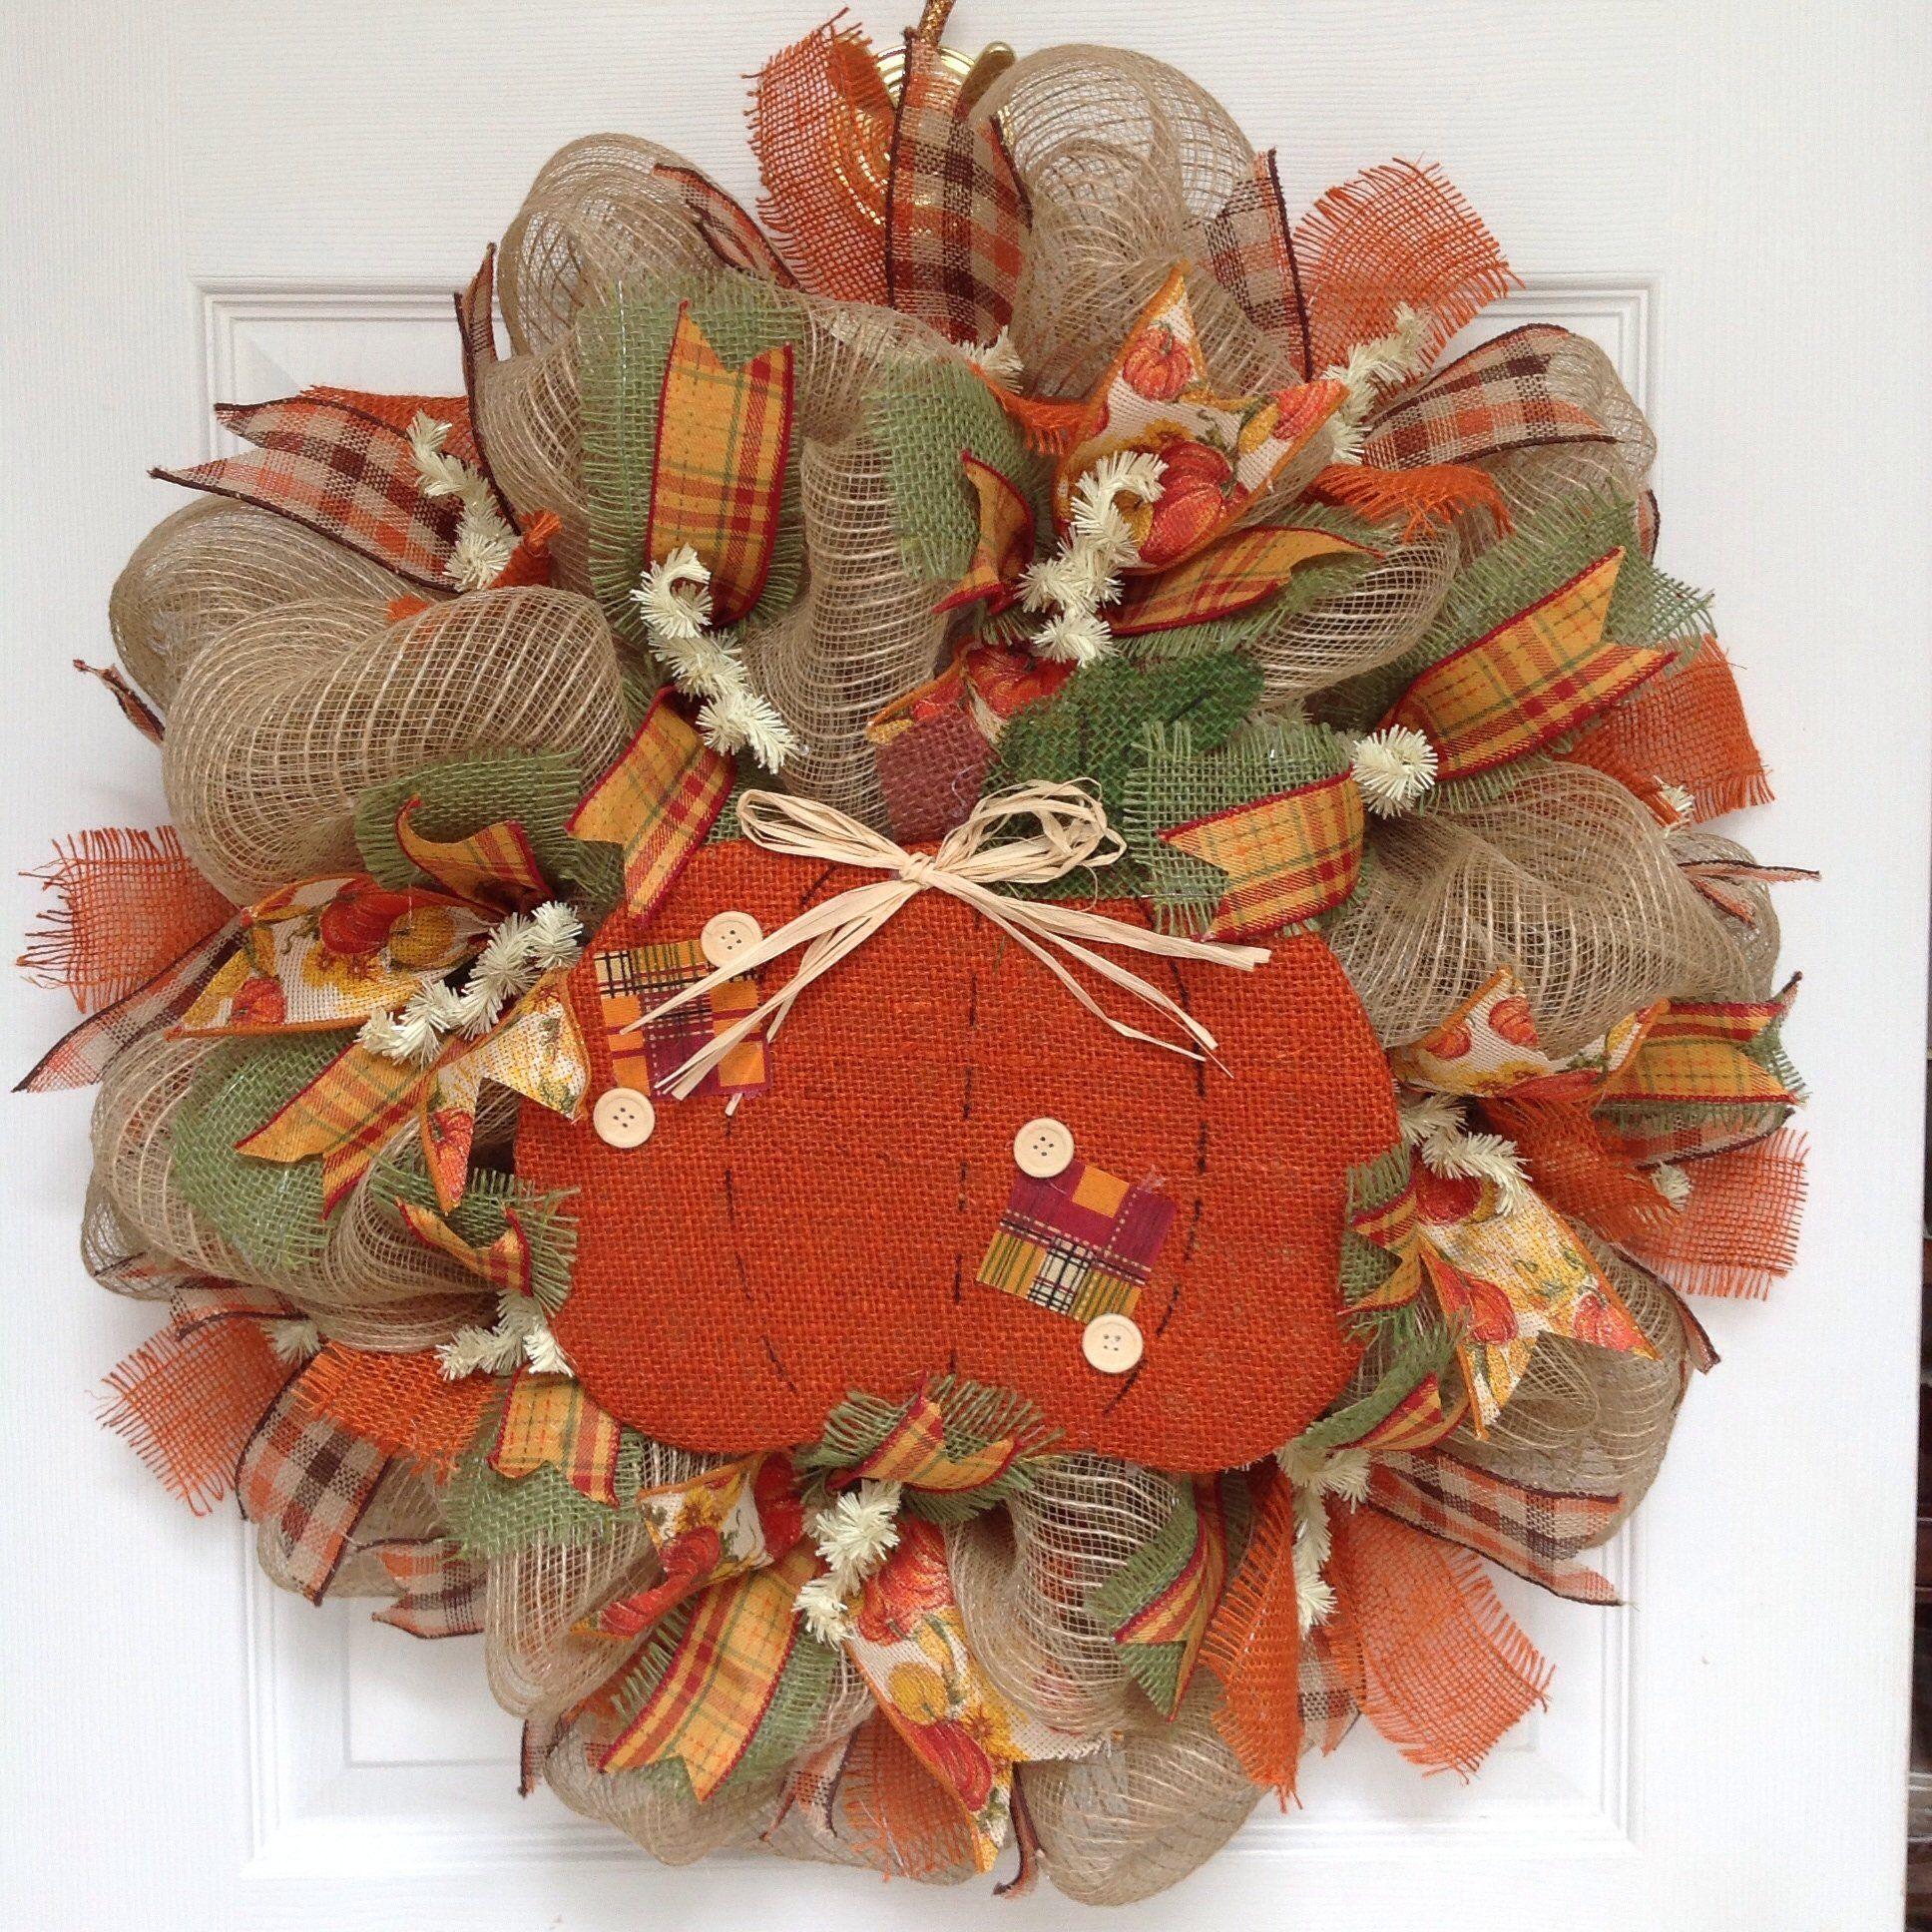 New! Full! Premium Handmade Country Pumpkin Button Autumn Deco Mesh Wreath